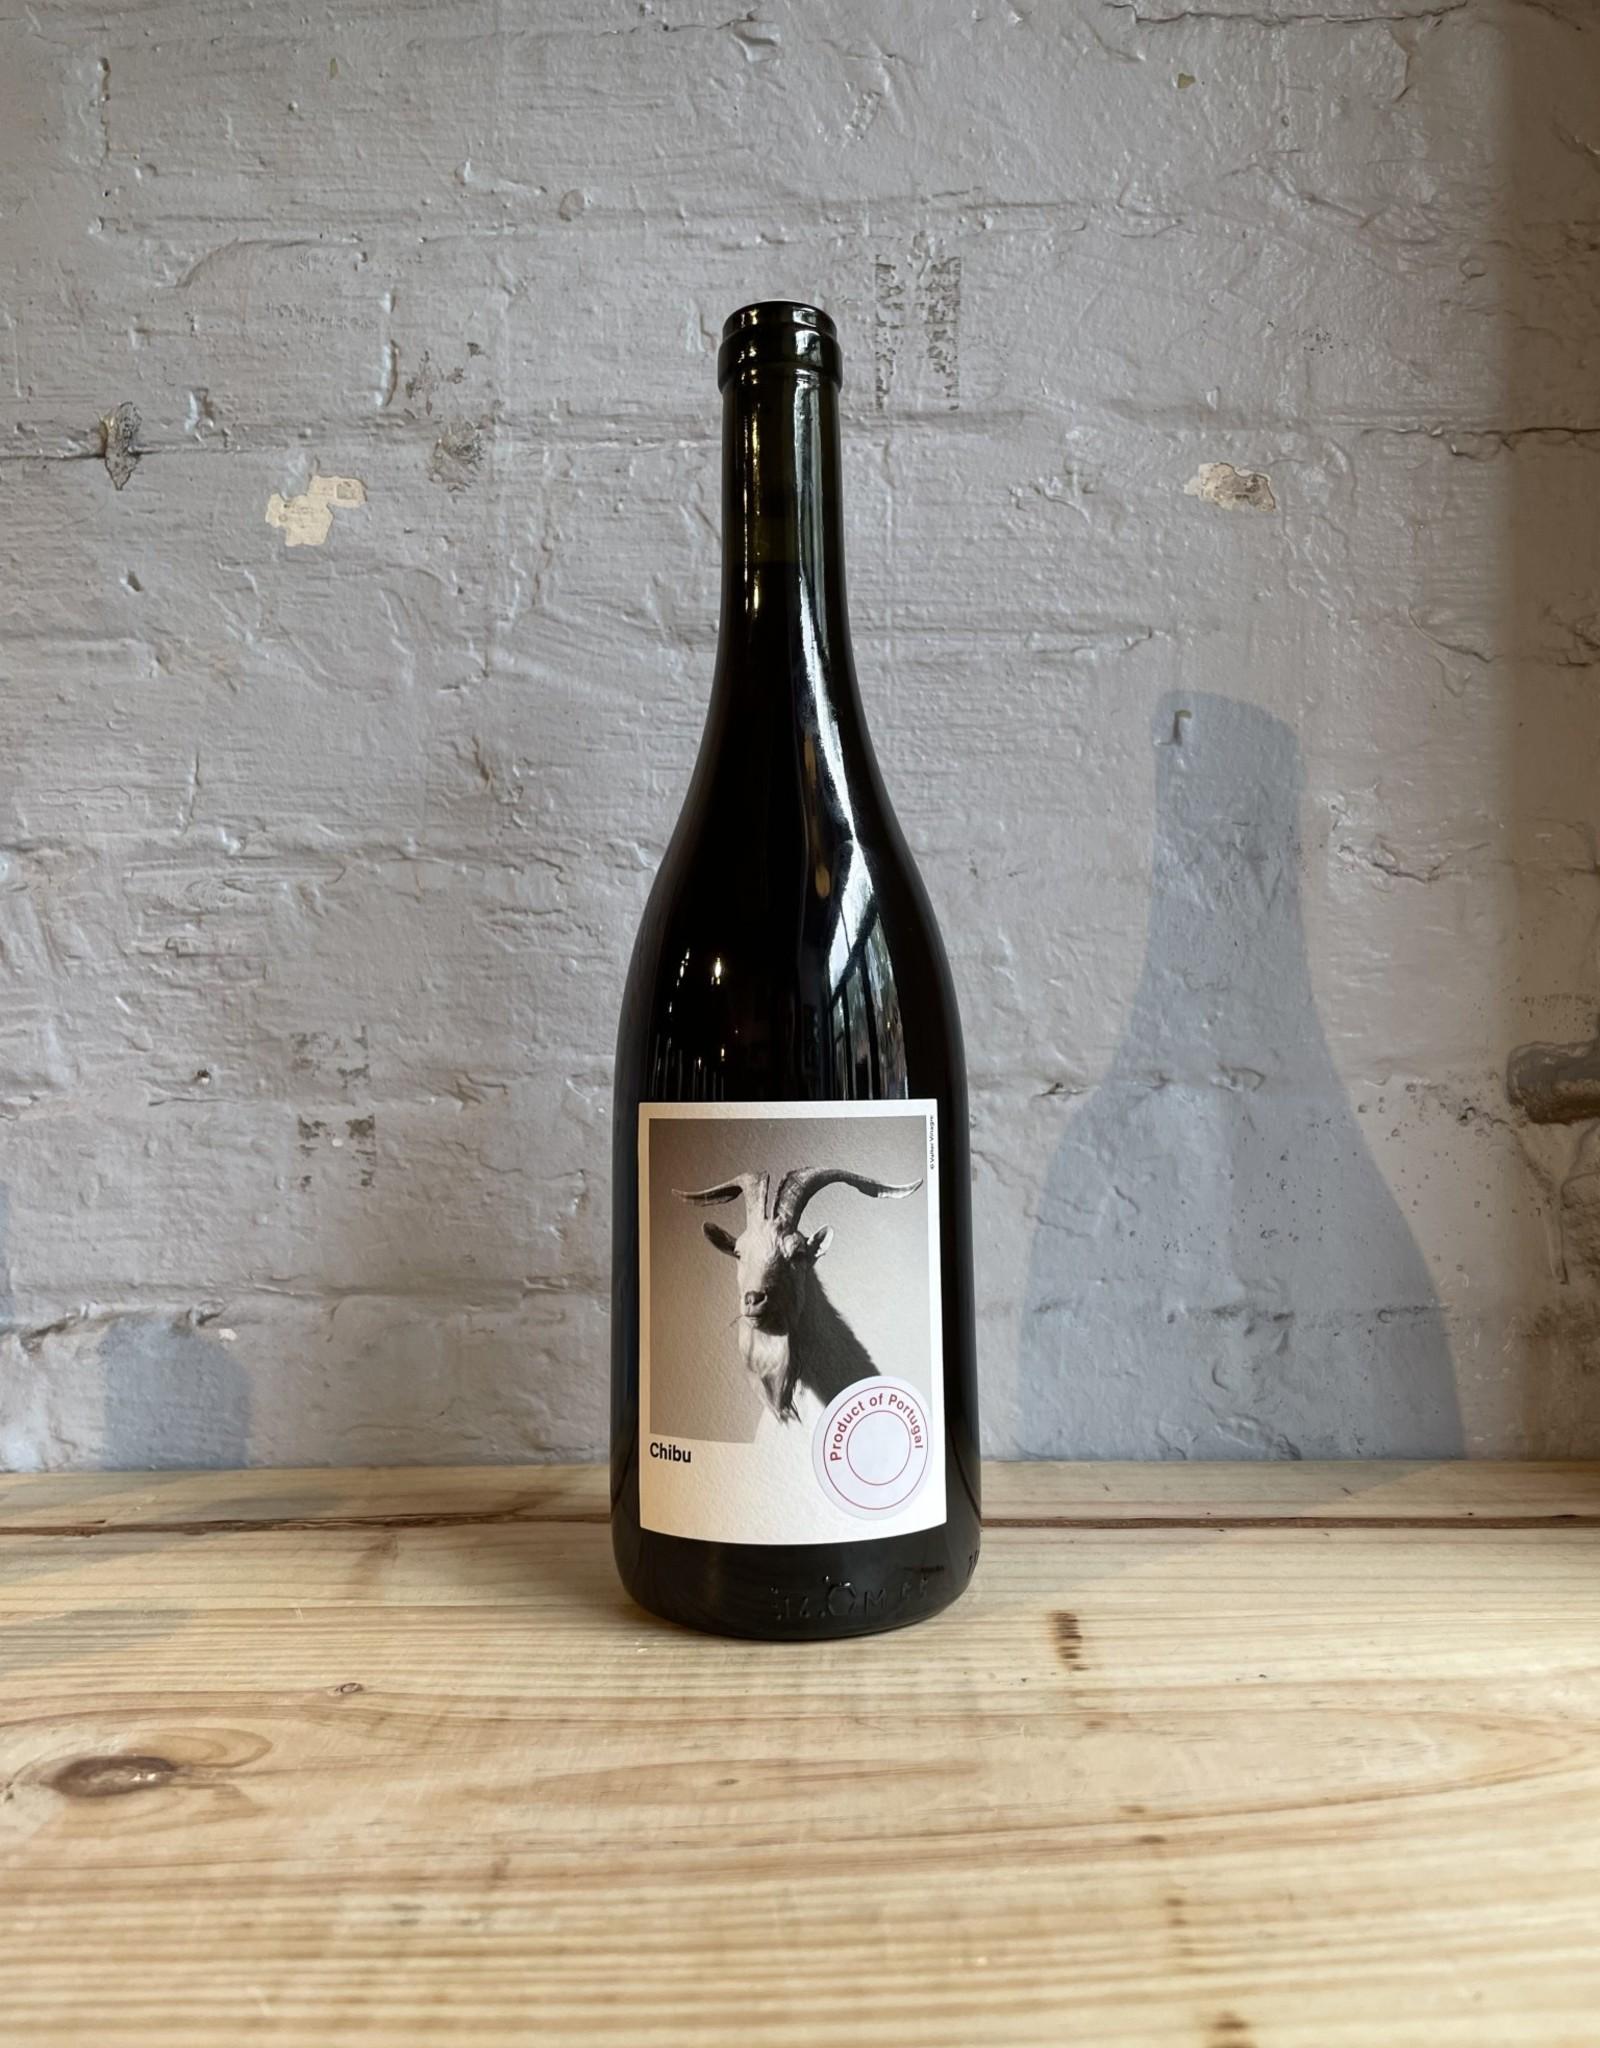 Wine 2019 António Lopes Ribeiro Chibu Tinto - Vinho Verde, Portugal (750ml)